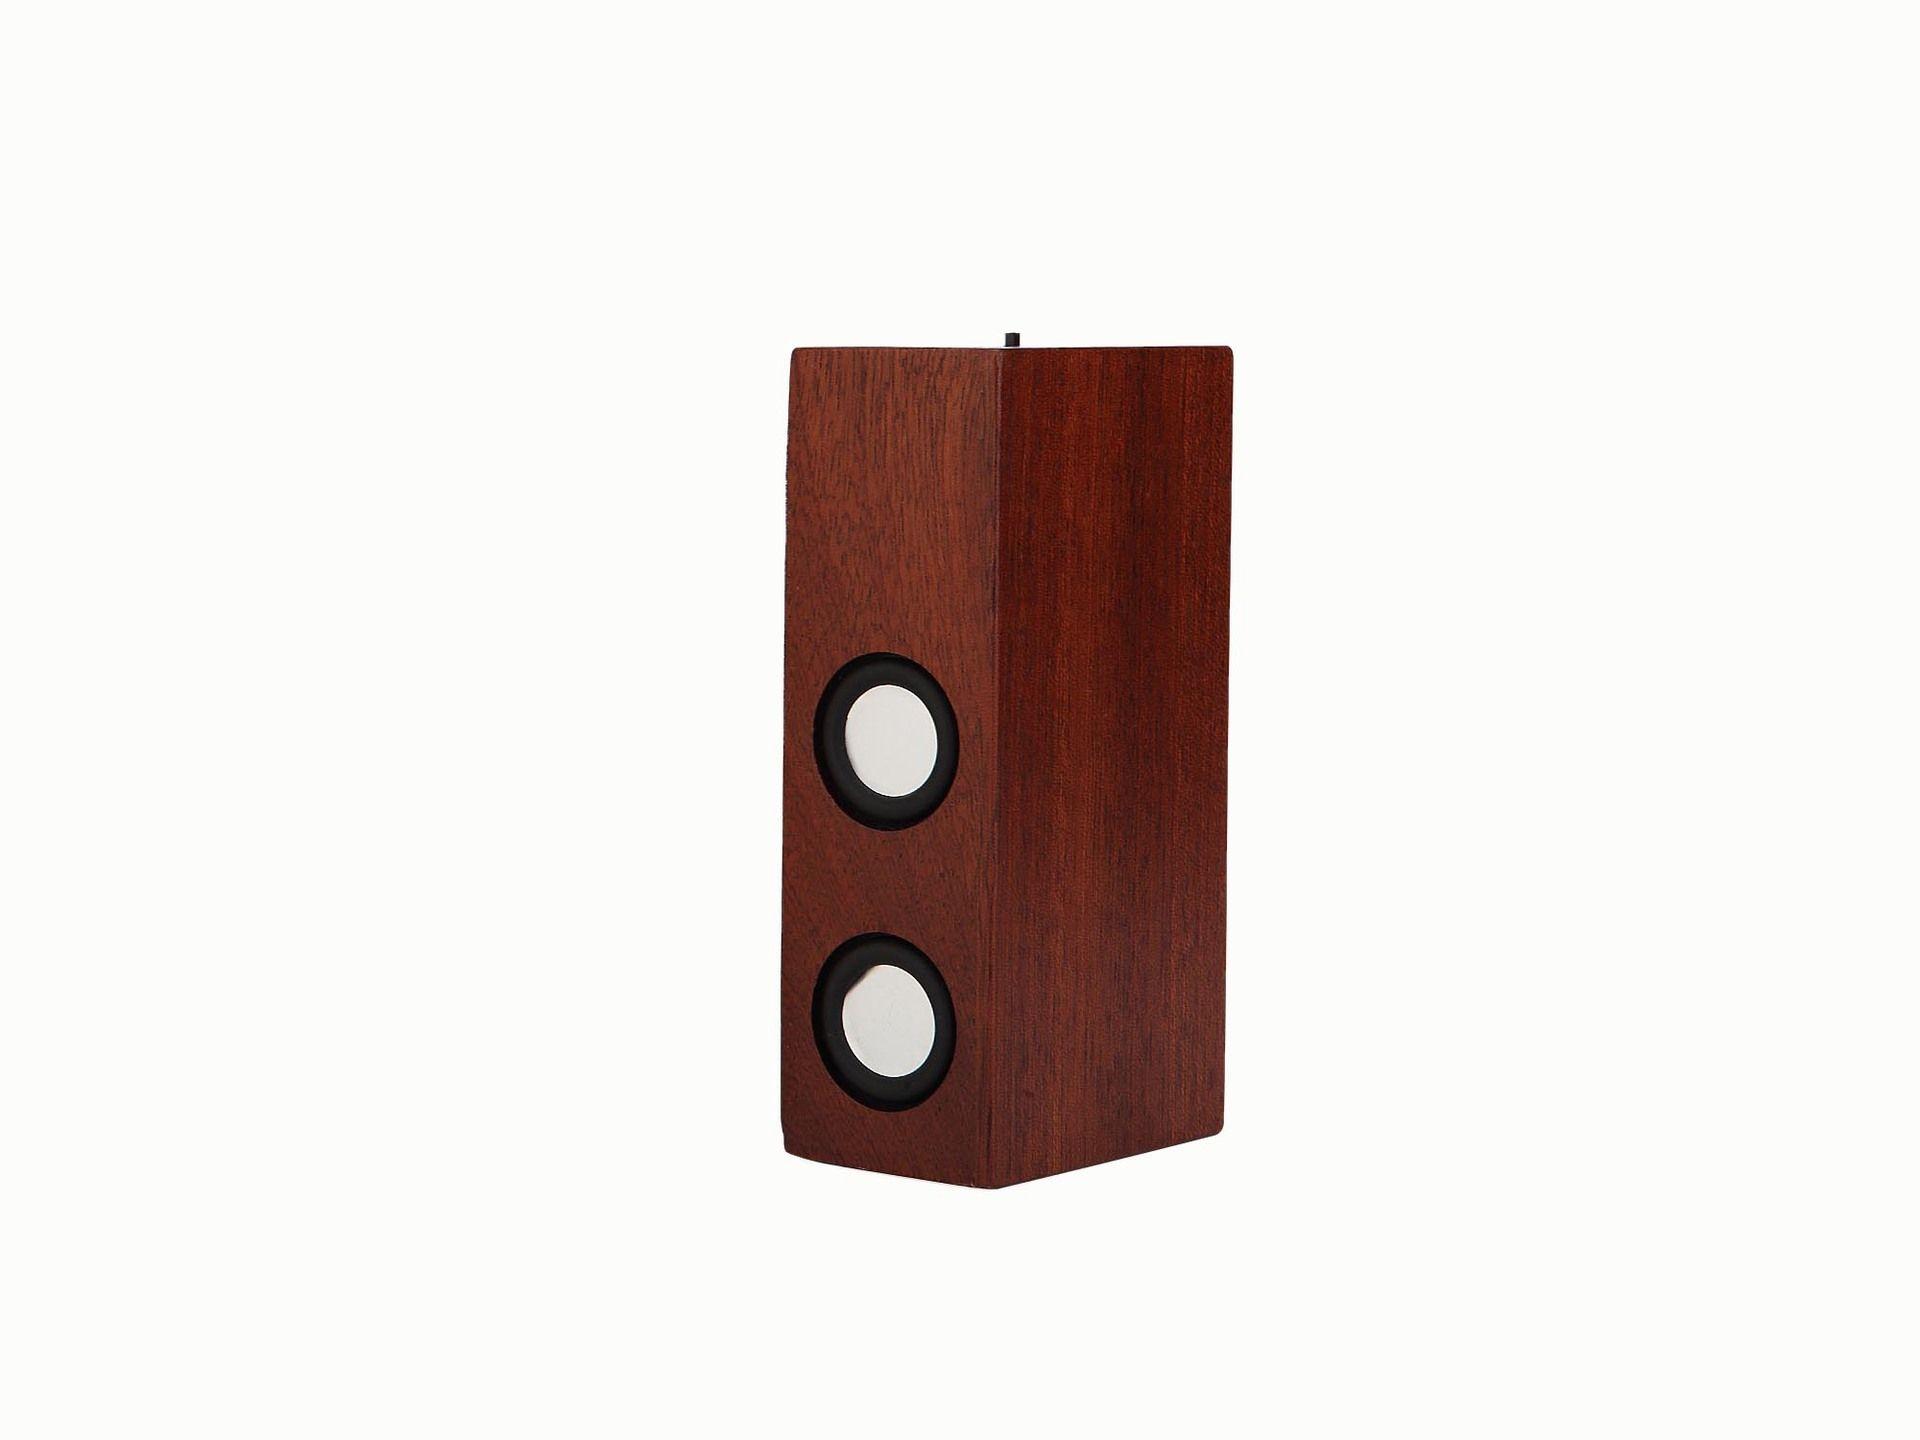 Qi Holz drahtlose Bluetooth-Lautsprecher Creative Desktop Multifunktions kabellose Induktions Lautsprecher mini klingen heiße Gegenstände